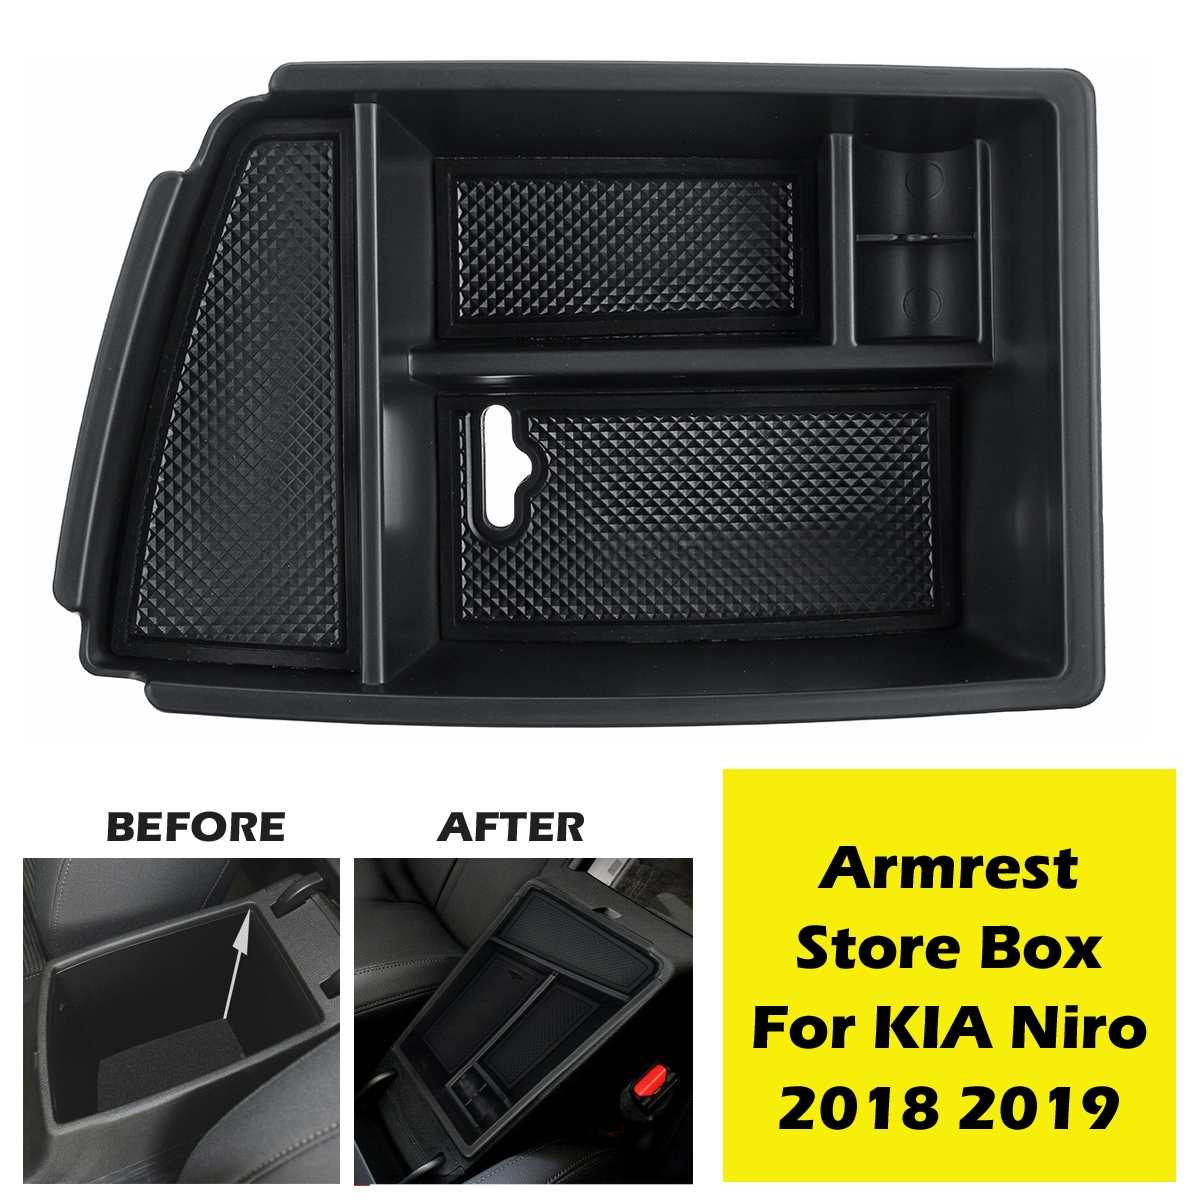 Preto auto interior do carro central apoio de braço caixa armazenamento titular bandeja molduras para kia niro 2018 2019 w/esteiras estiva tidying